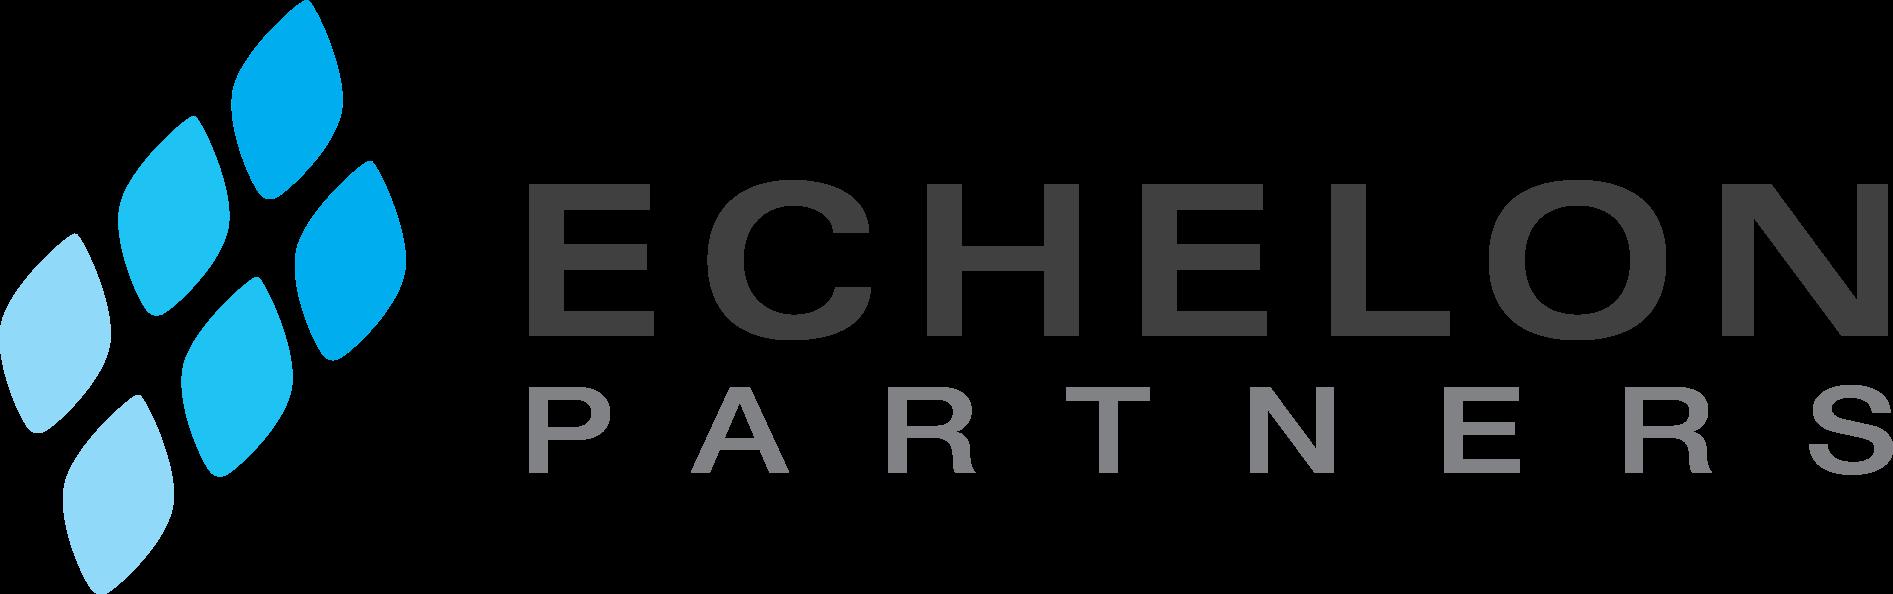 Echelon Partners